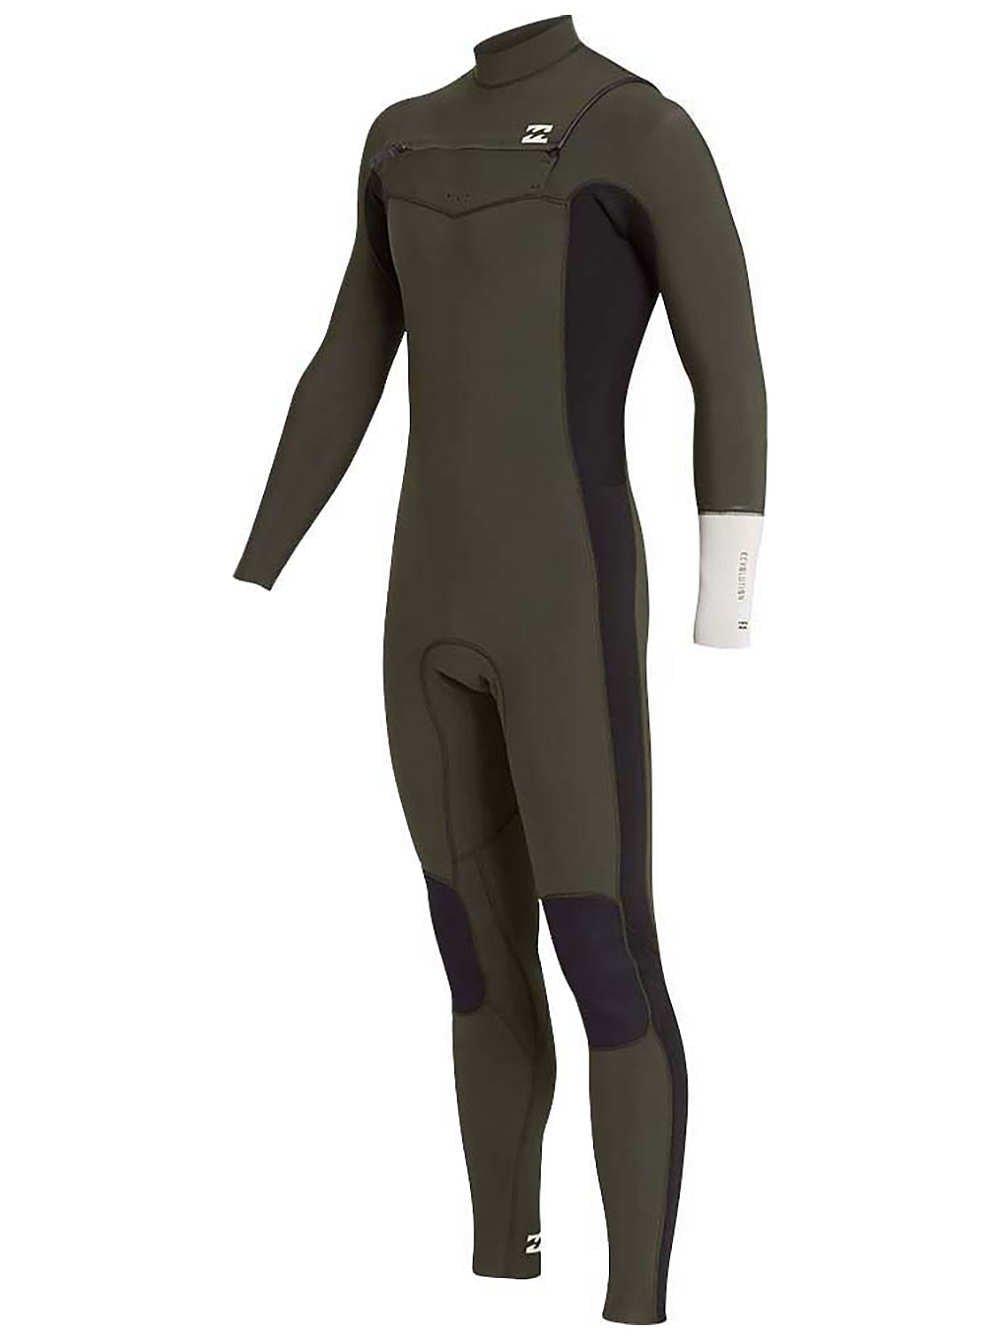 BILLABONG 2018 19 Furnace Revolution 5 4mm Chest Zip Wetsuit Dark Olive L45M06